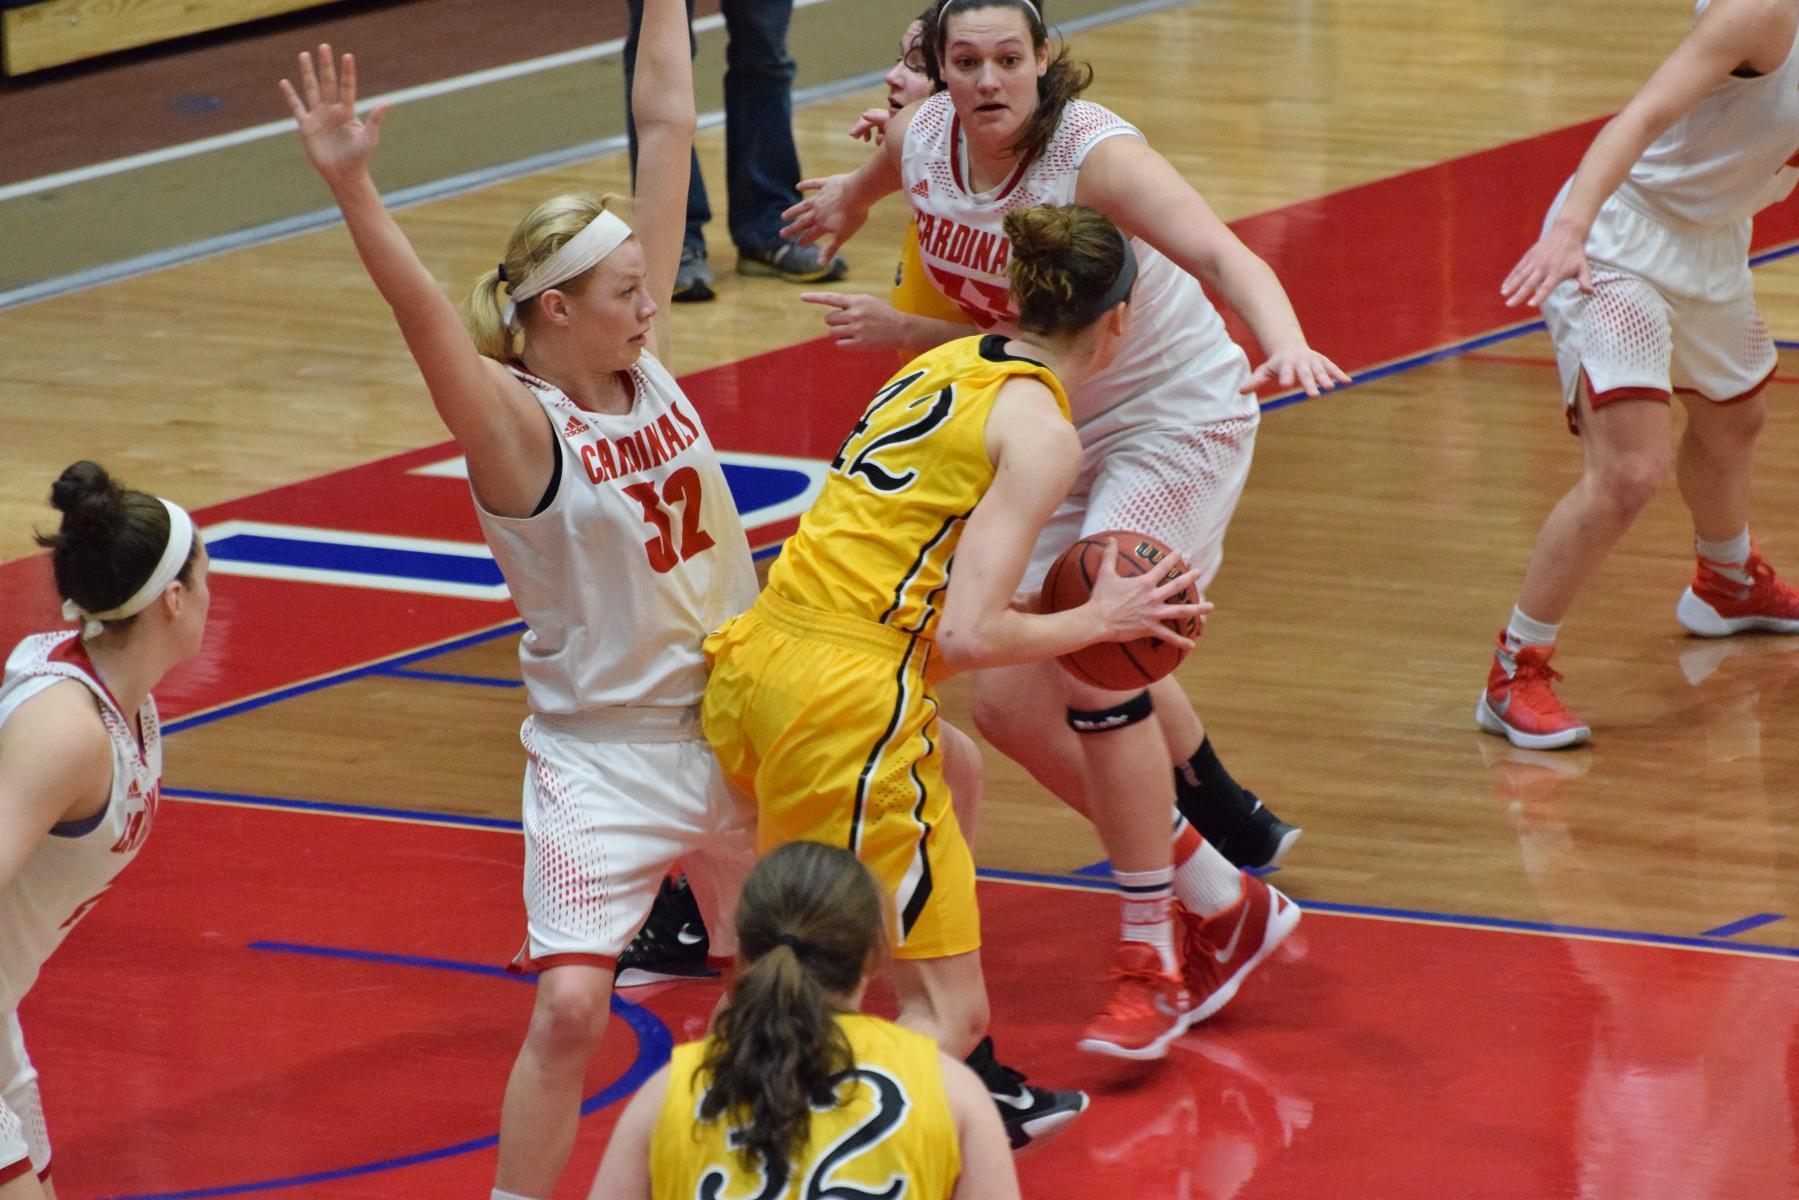 Women's Basketball vs. Michigan Tech - February 13. 2016 - Saginaw Valley State